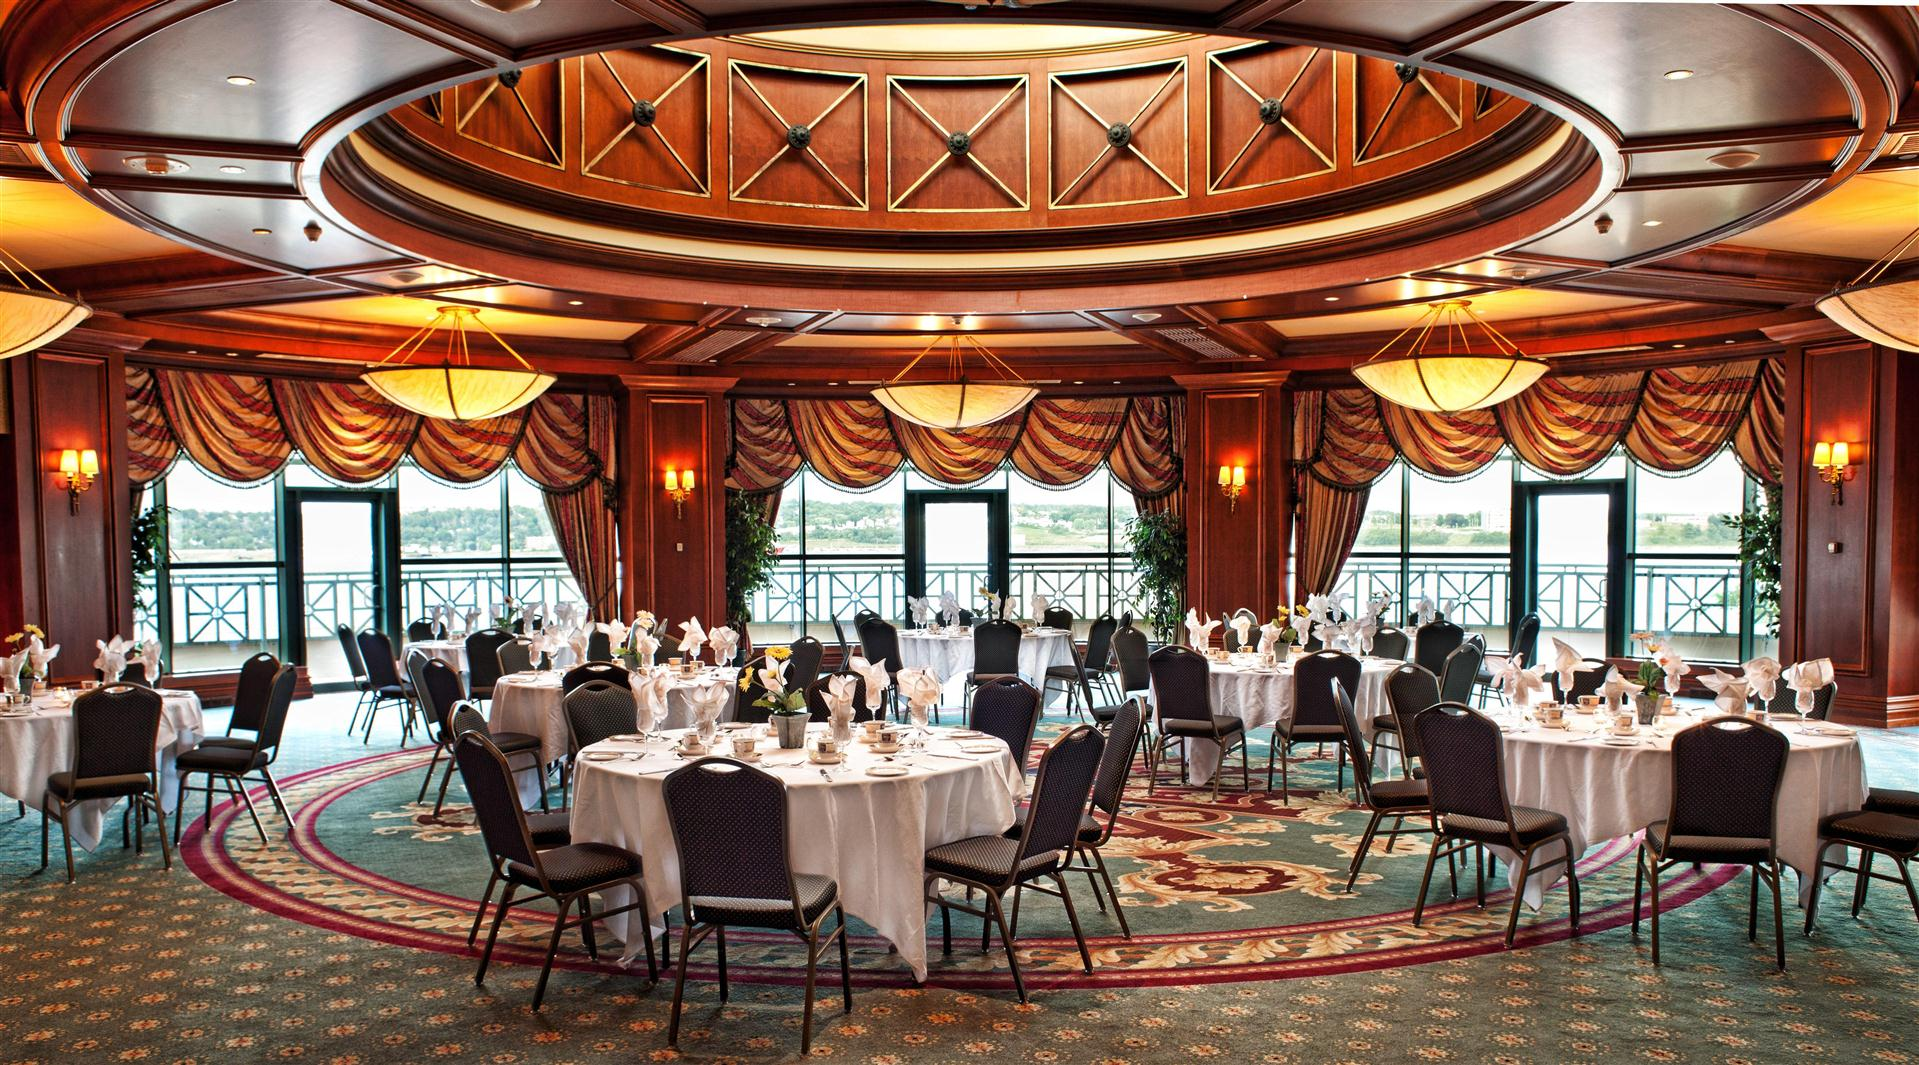 Schooner room casino nova scotia halifax silver spur casino carson city